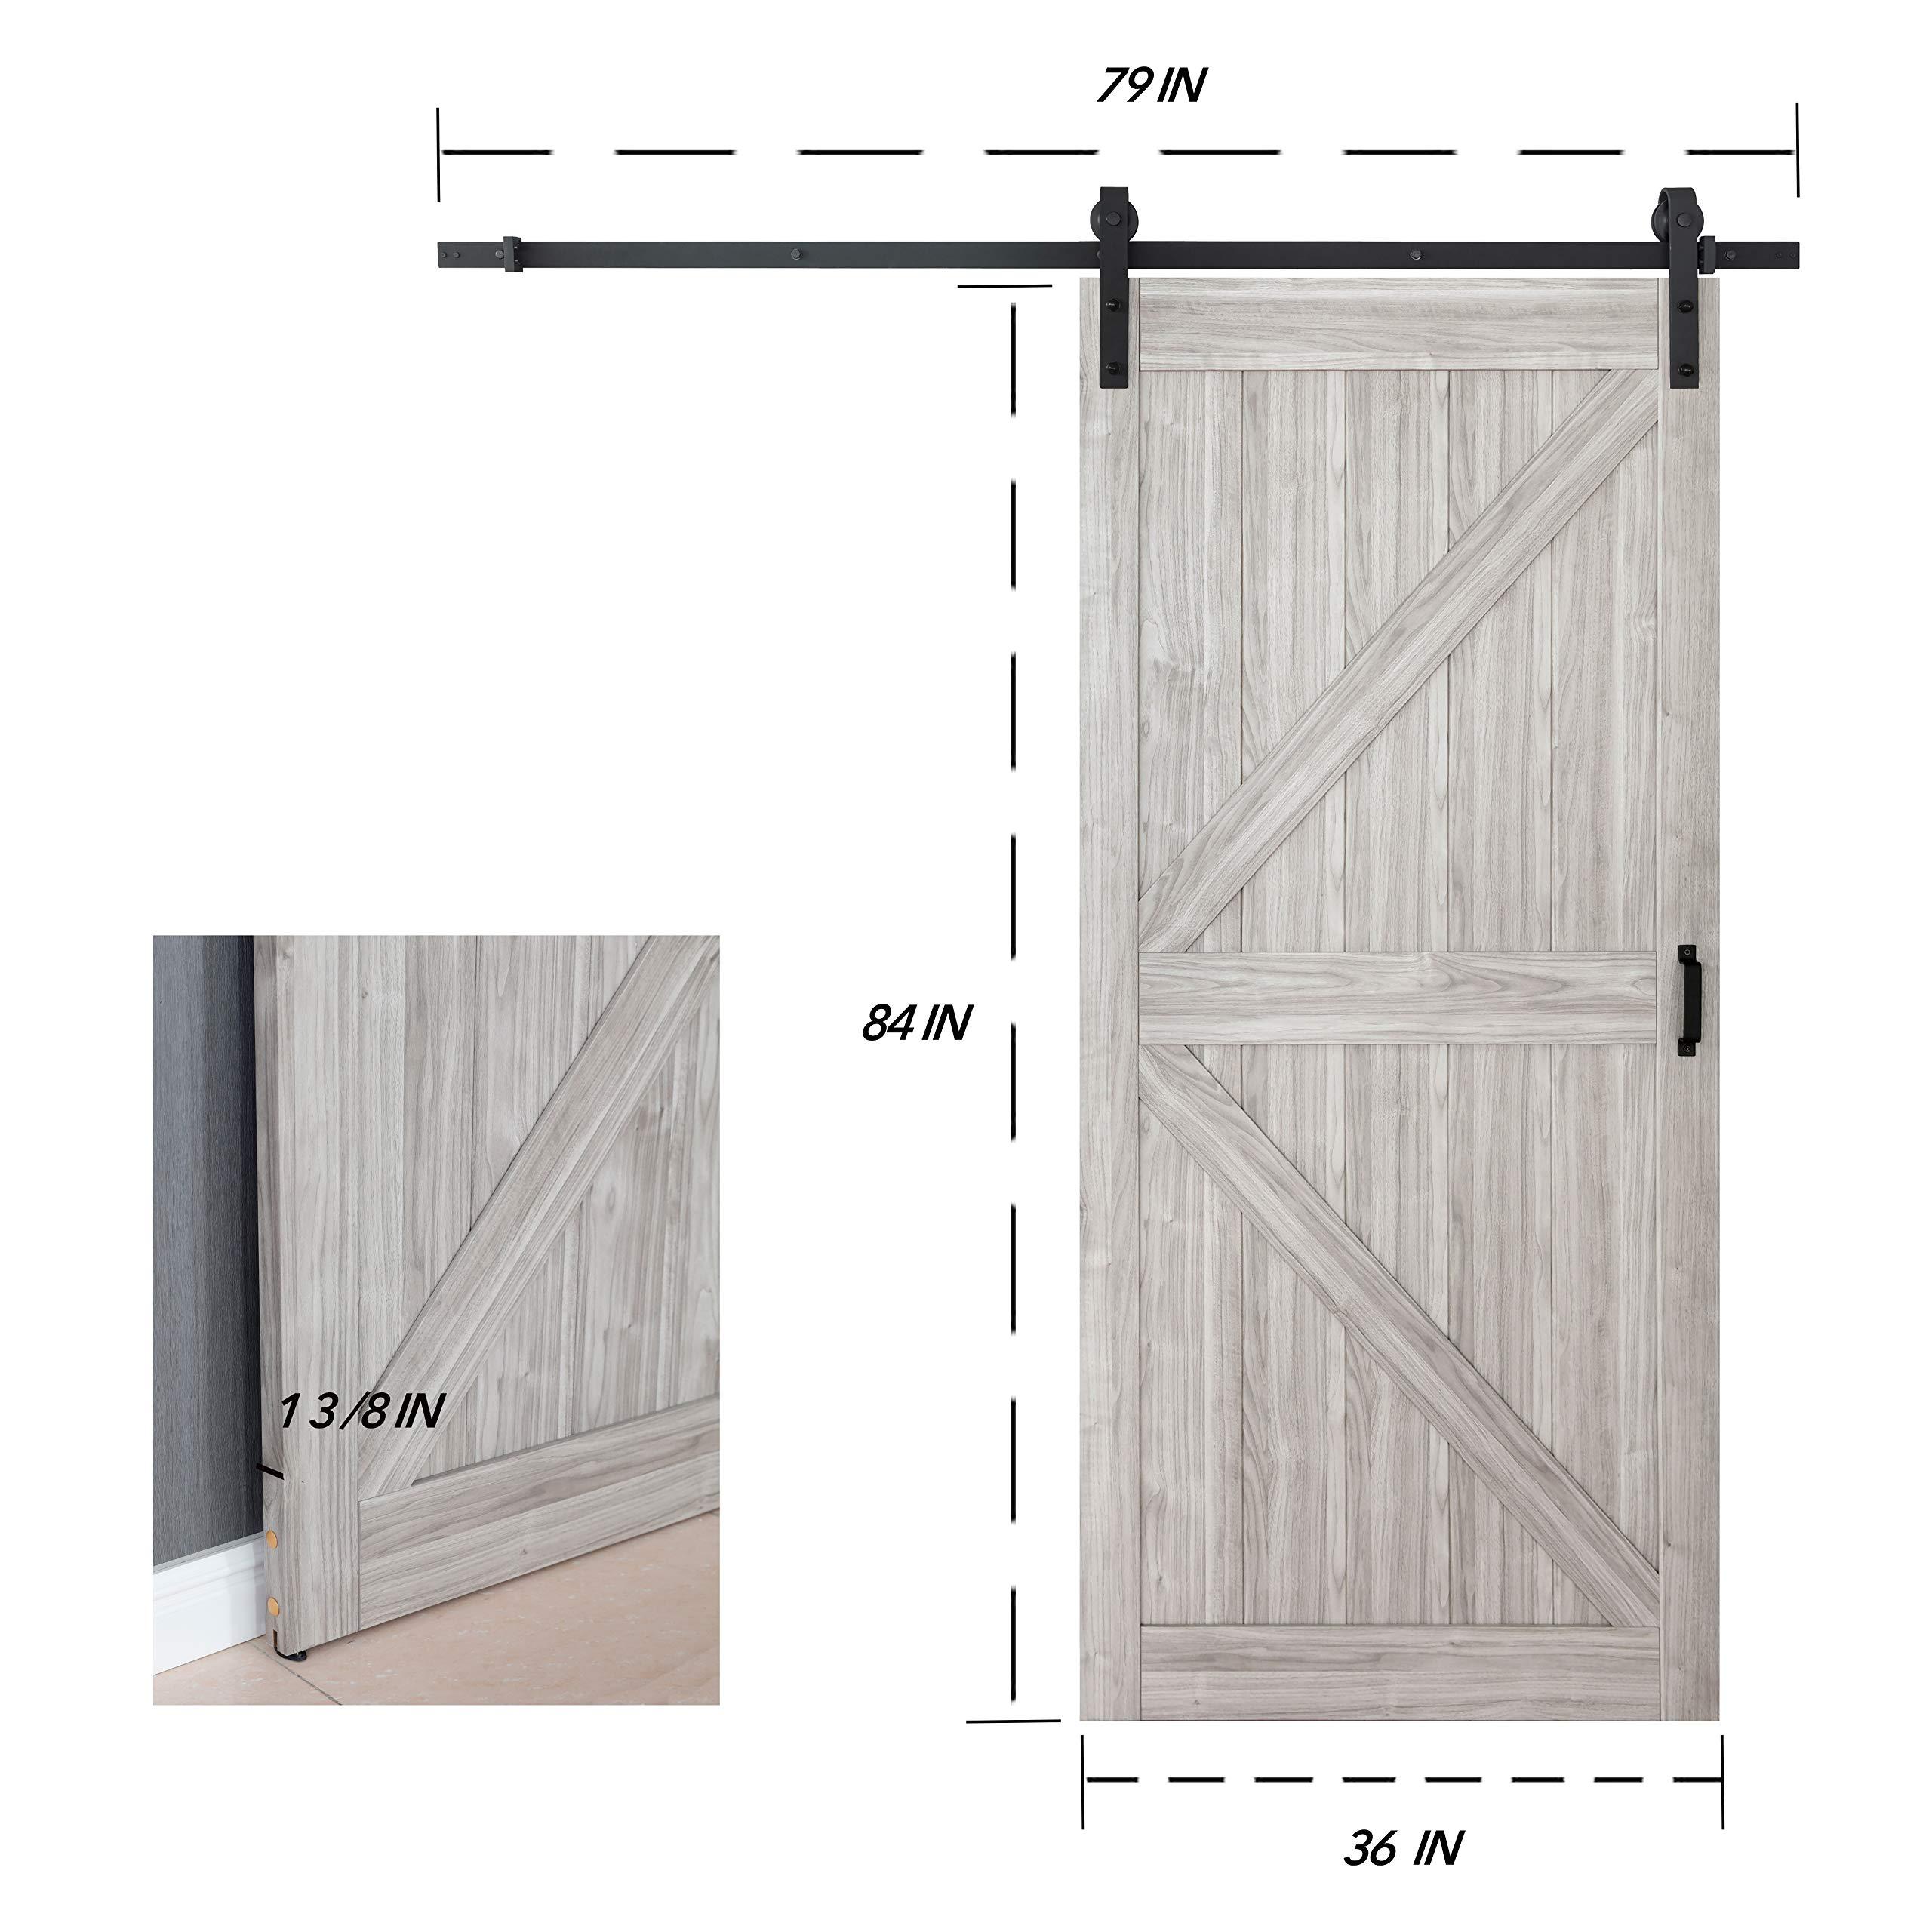 TENONER 36in x 84in Grey K-Frame Sliding Barn Door, 6.6ft Barn Door Hardware Kit & Handle Included by TENONER (Image #5)